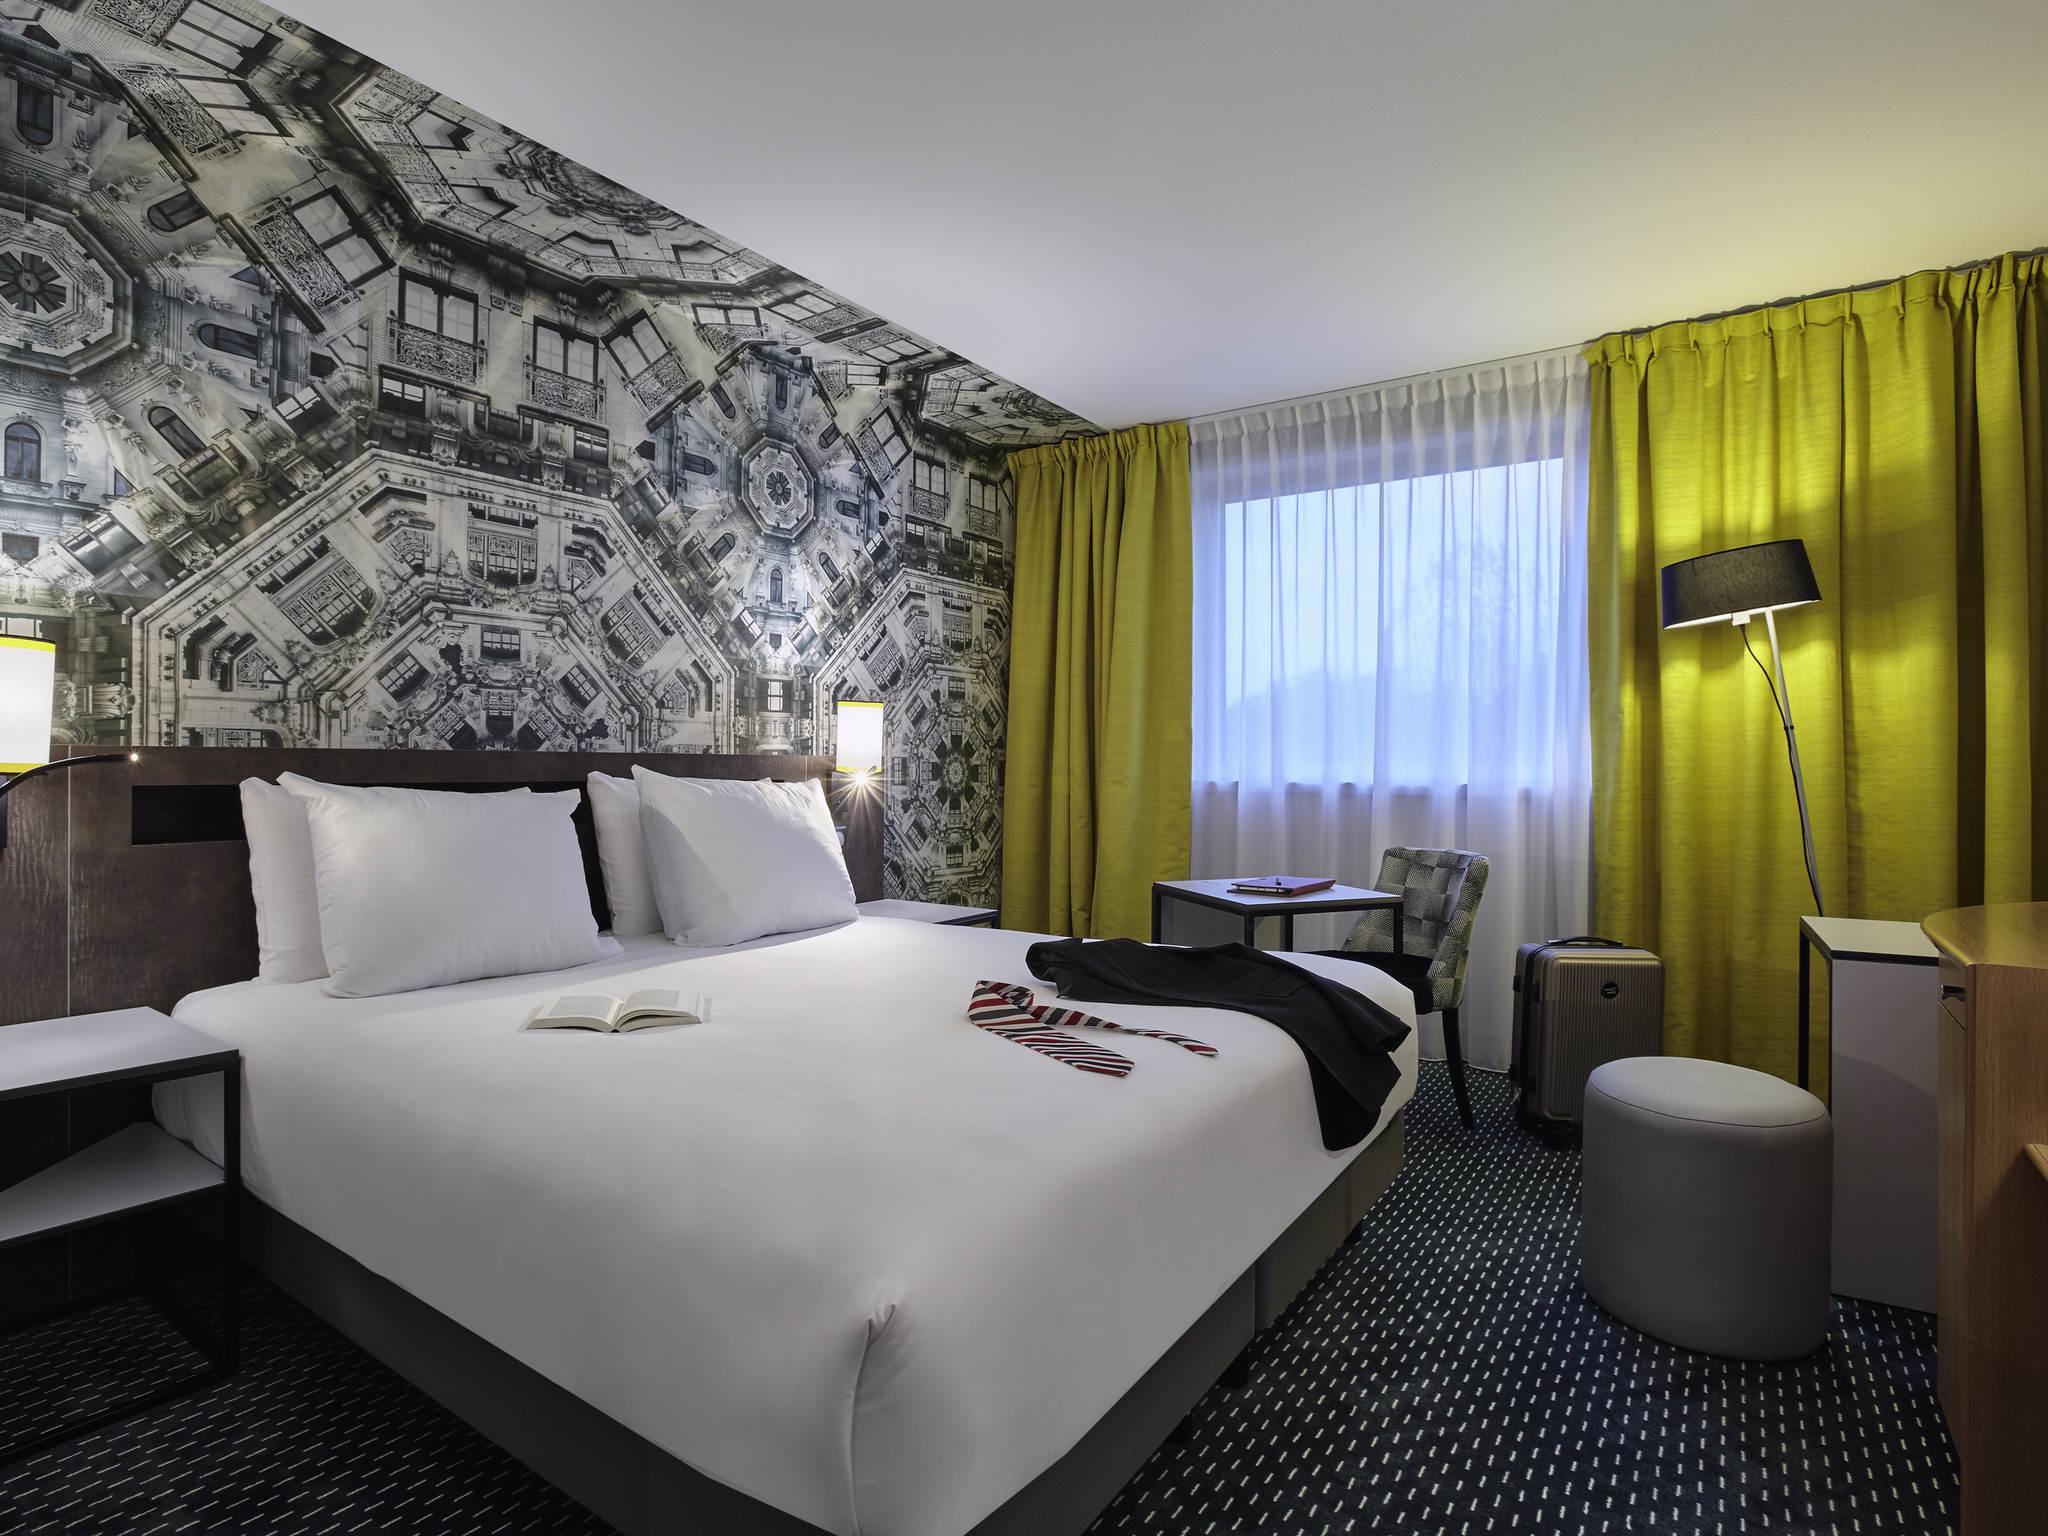 Hotel – Hotel Mercure Paris Roissy Charles de Gaulle